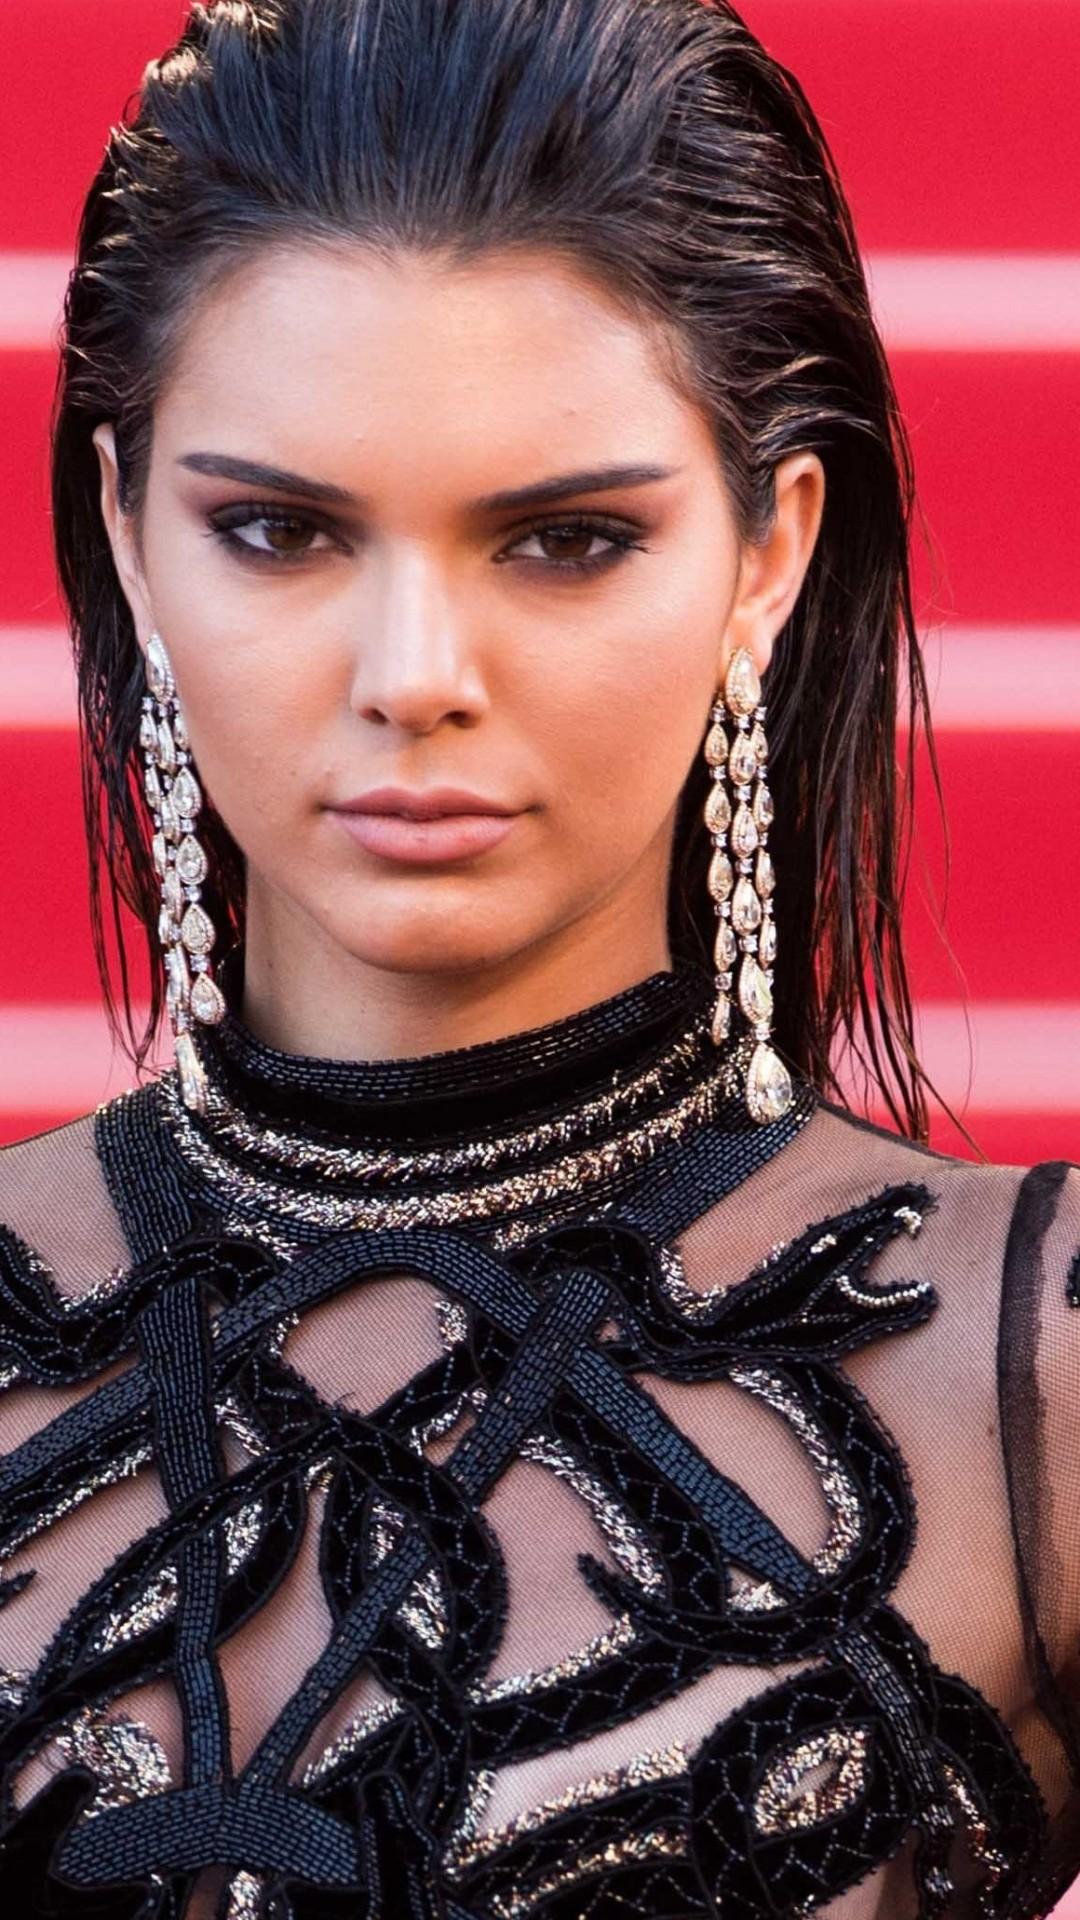 Wallpaper Kendall Jenner Cannes Film Festival 2016 Red Carpet Celebrities 10831